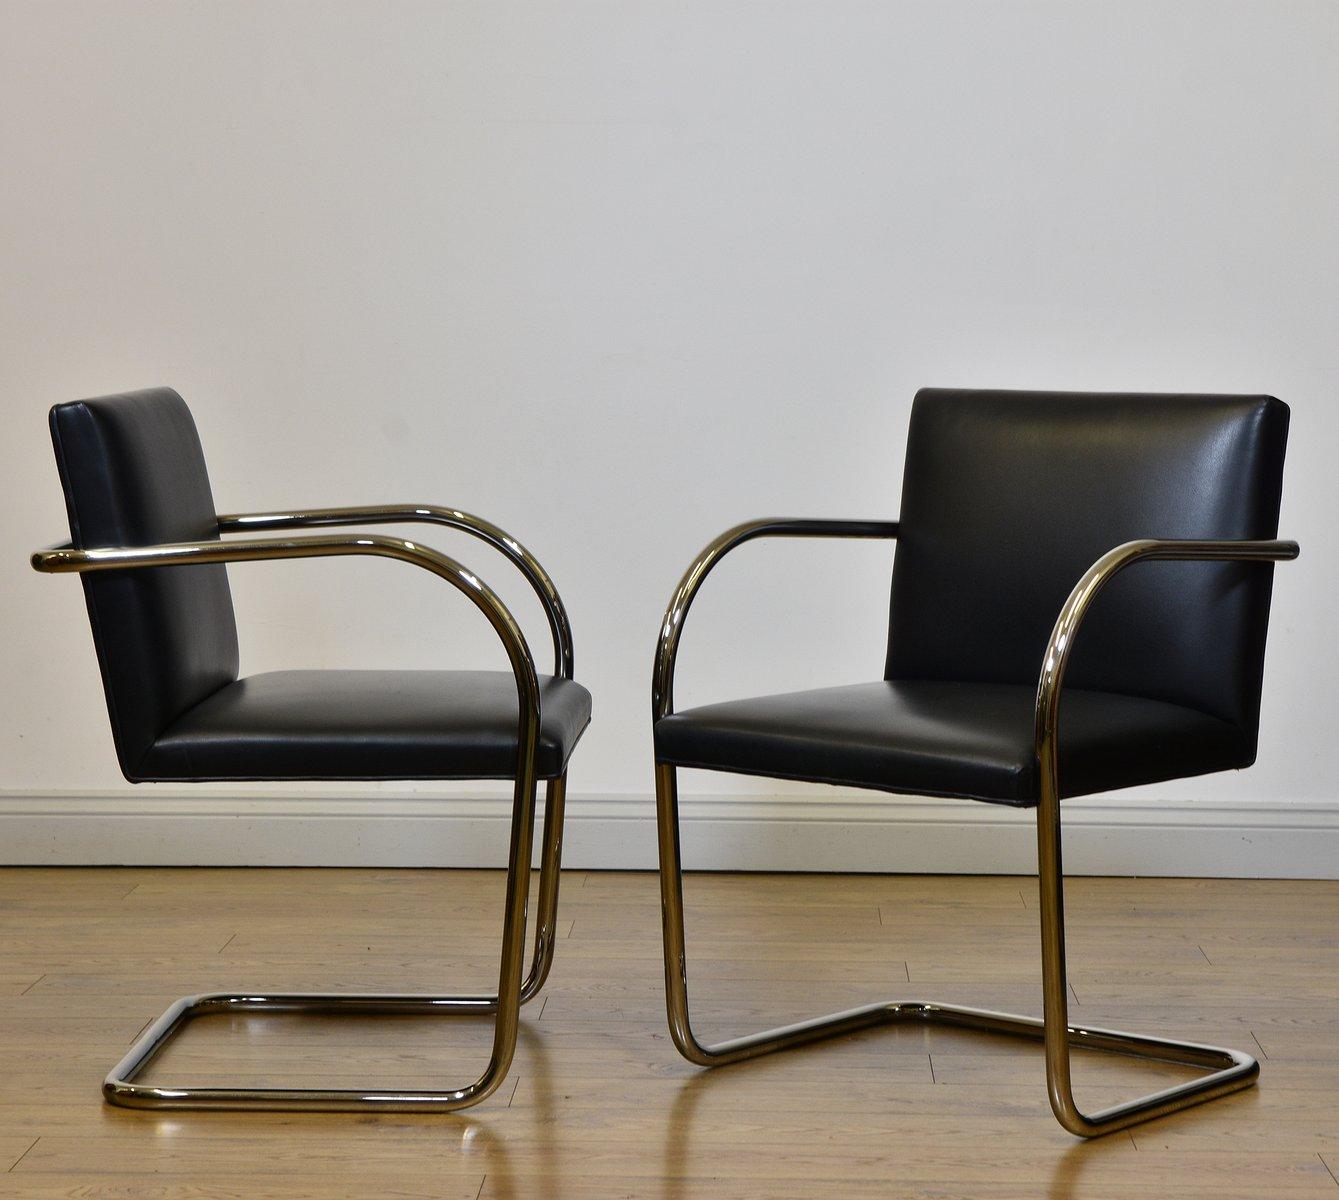 Chaise Brno Mies Van Der Rohe tubular steel & black leather brno chairsmies van der rohe for knoll,  1980s, set of 2